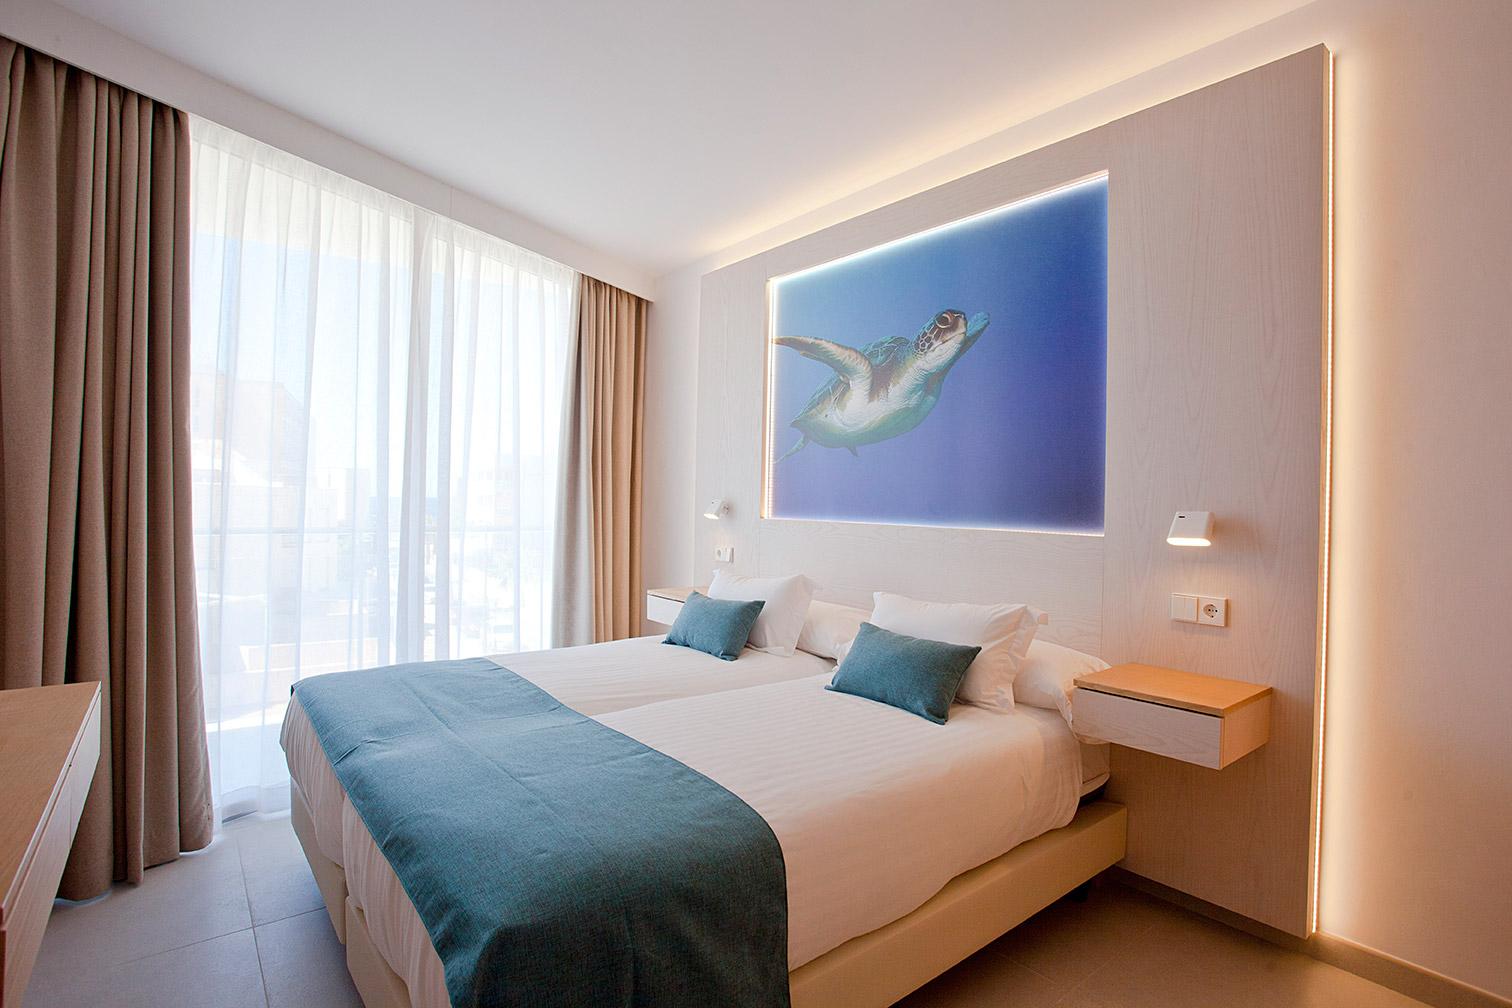 Dormitorio doble con un cuadro de una tortuga